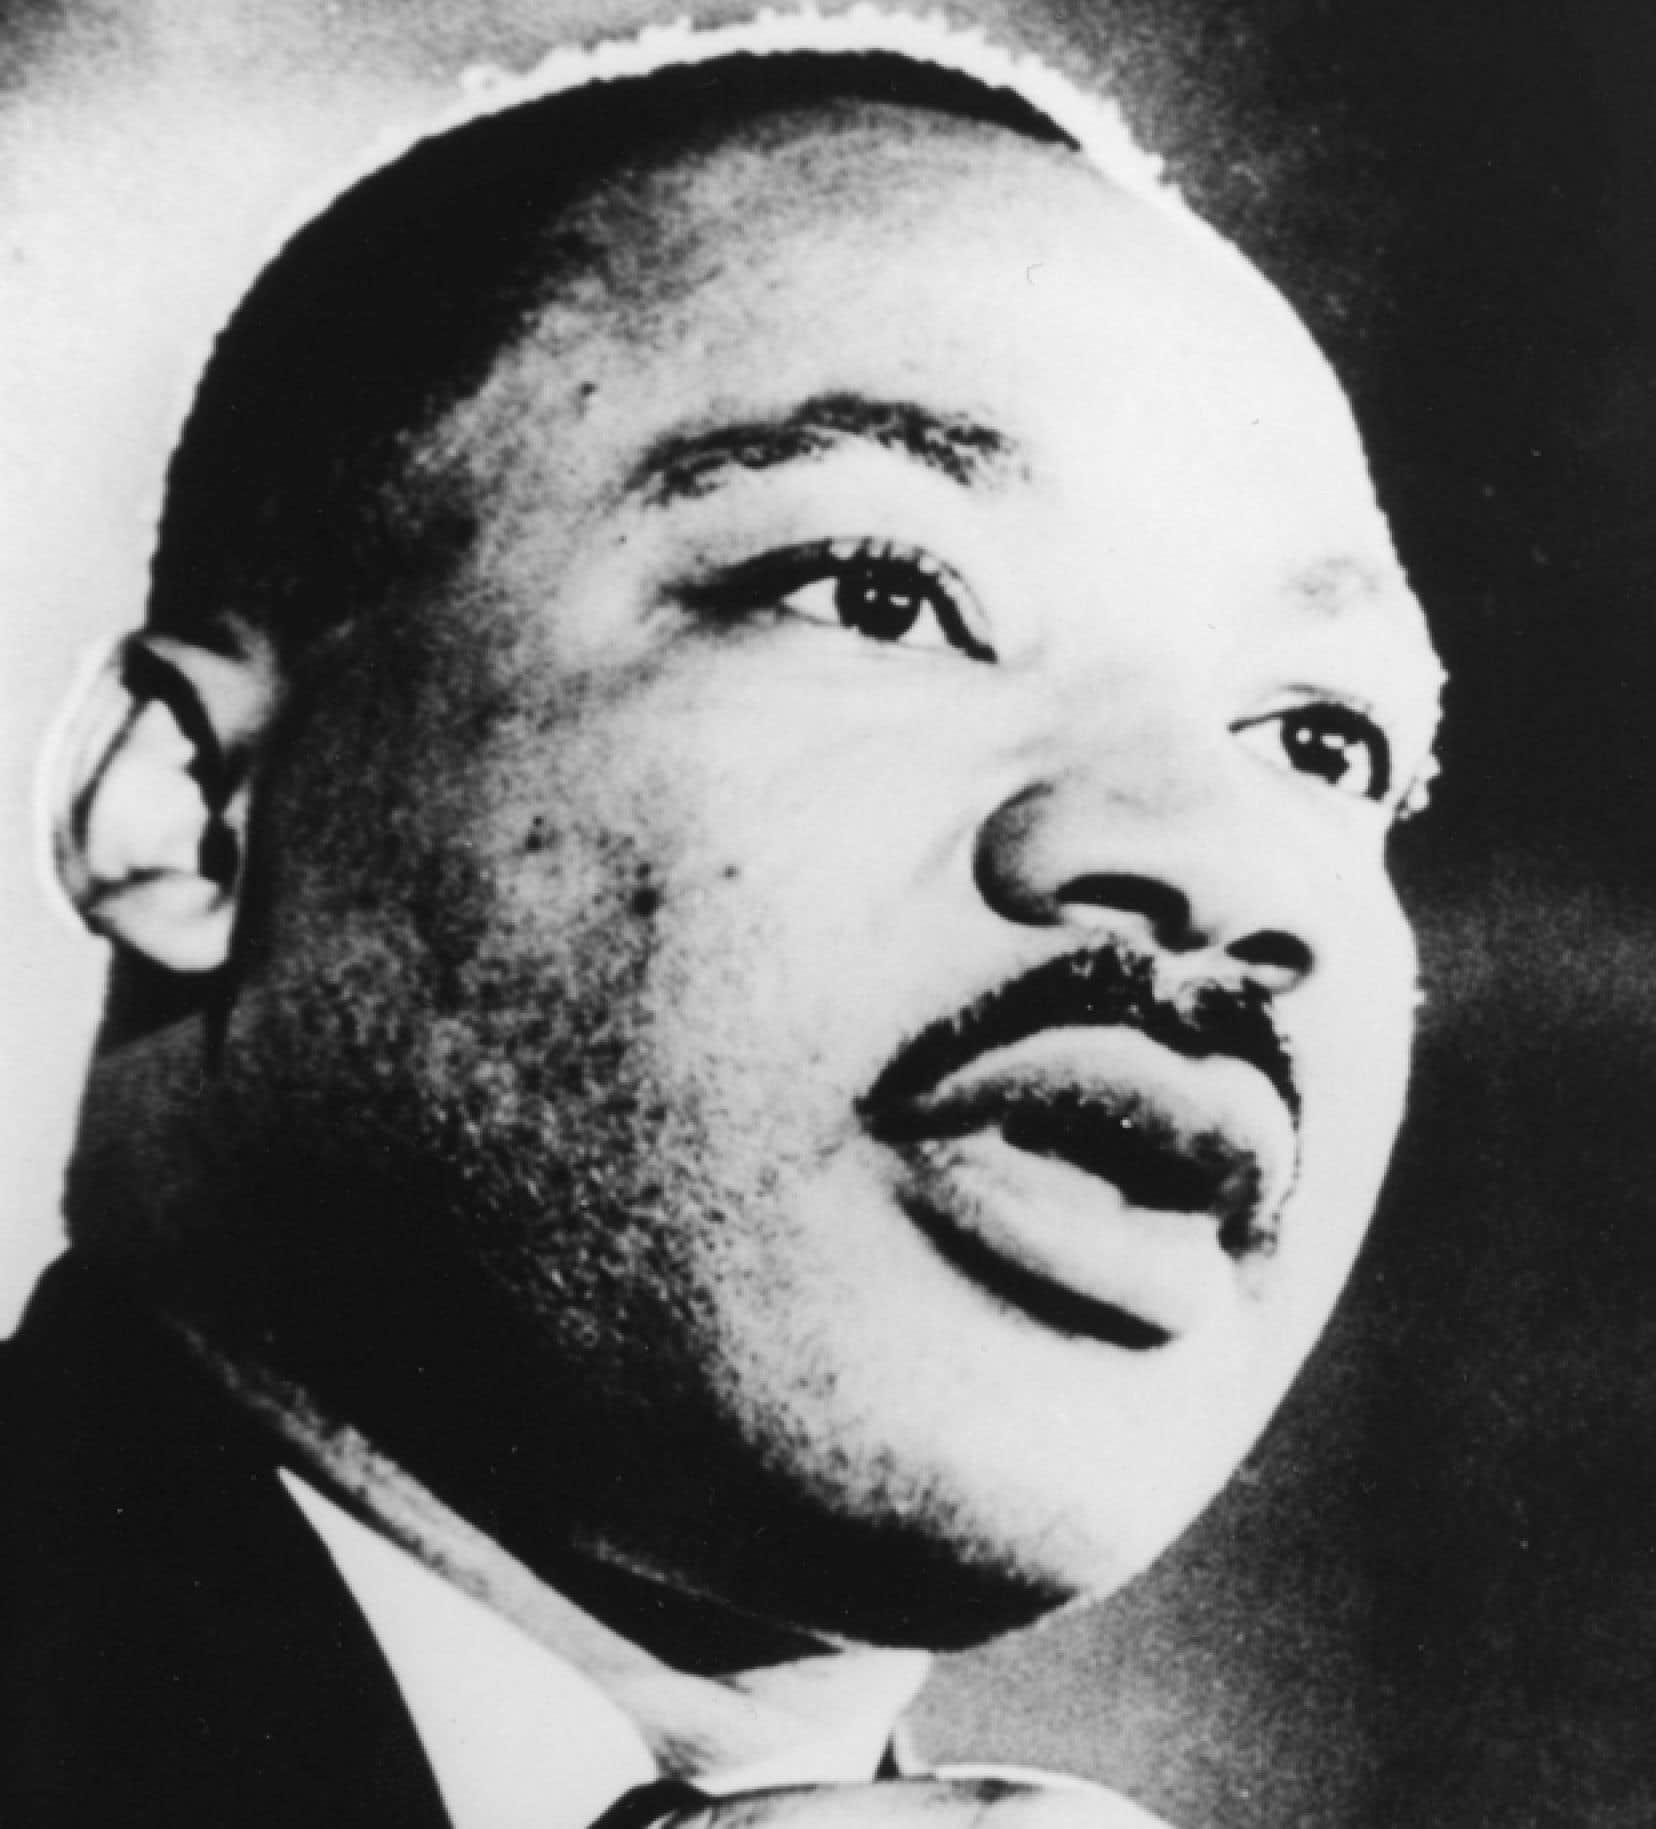 Le révérend Martin Luther King Jr.